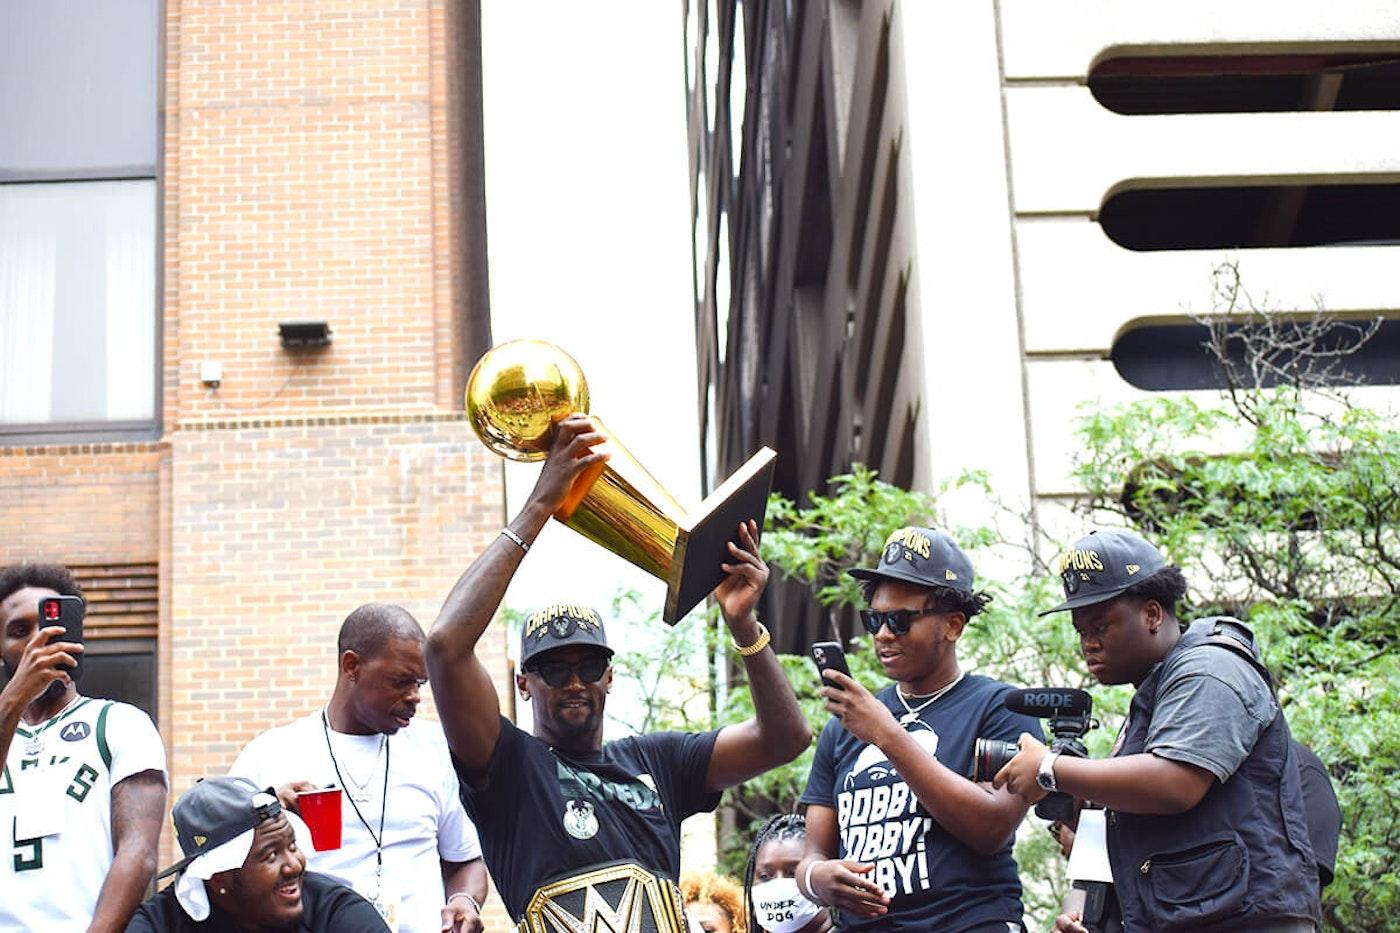 Milwaukee Bucks fan favorite Bobby Portis hoists the Bucks' championship trophy over his head during the team's championship parade in downtown Milwaukee. (Photo by Jonathon Sadowski)